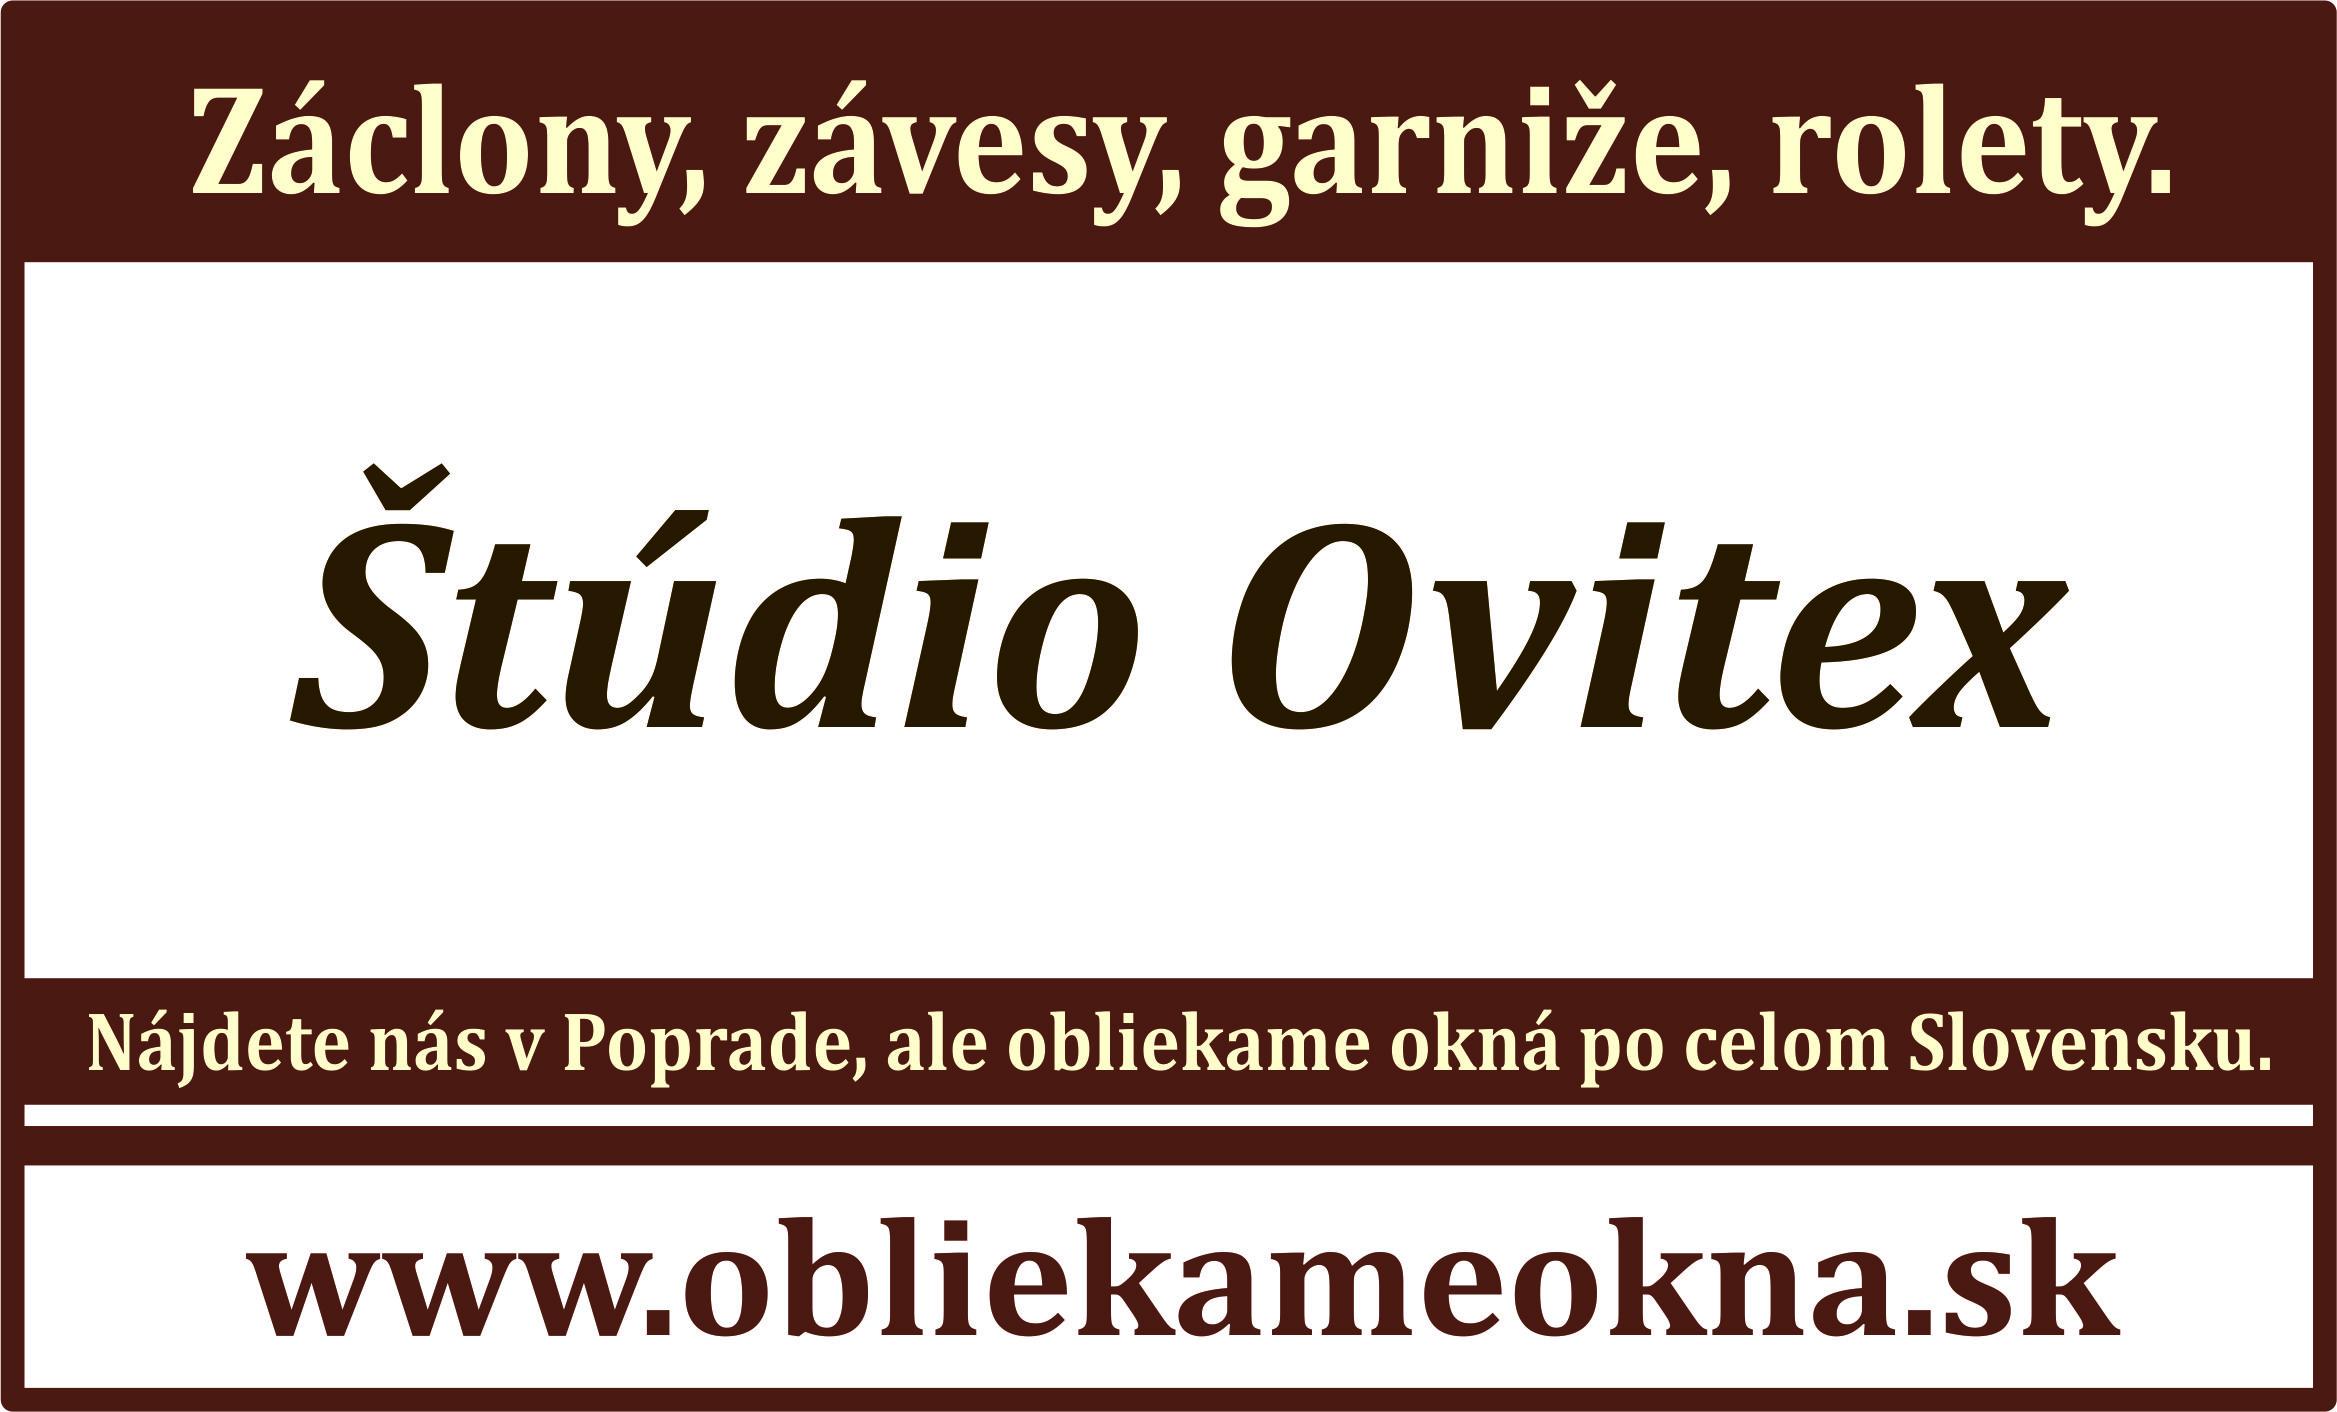 obliekameokna.sk